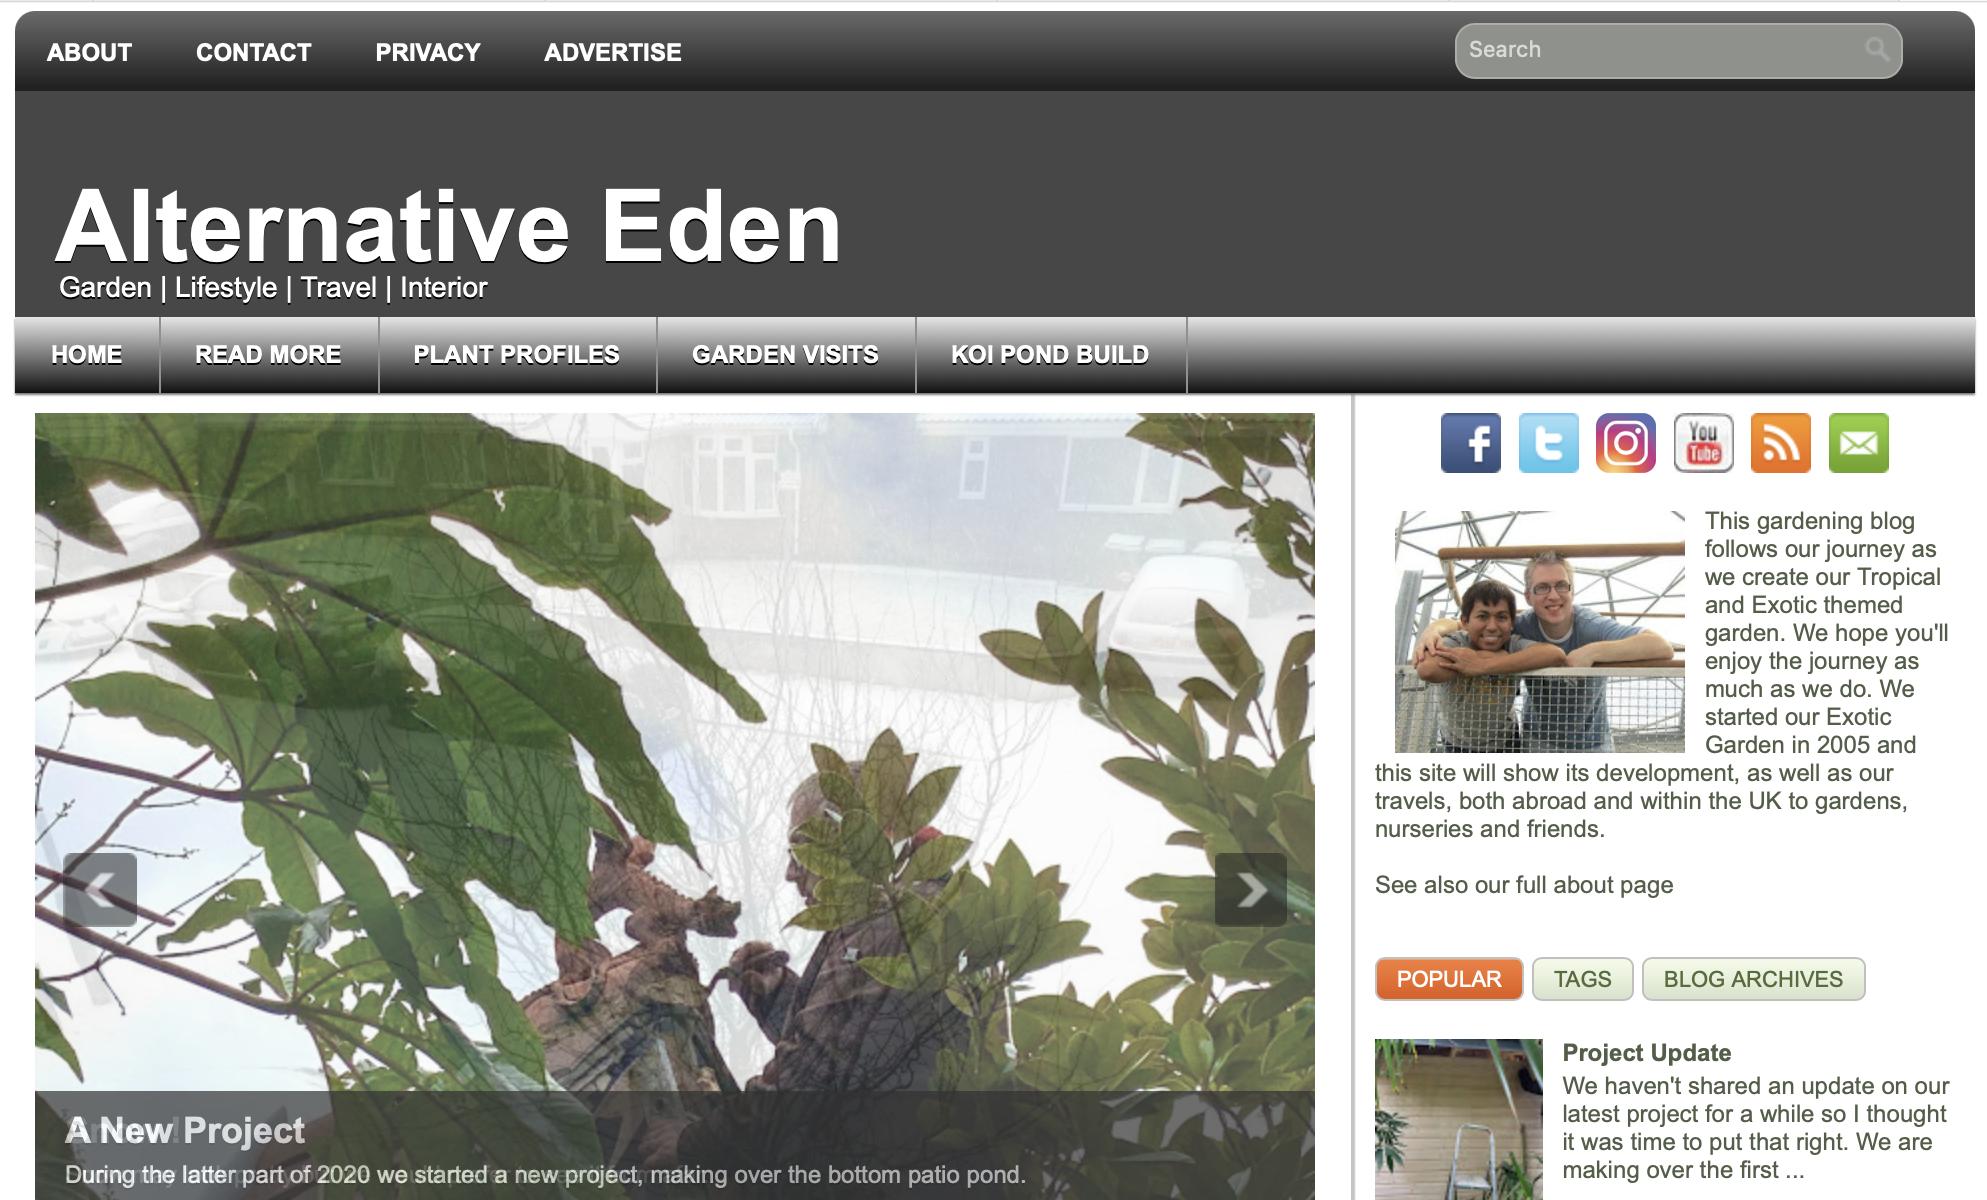 Alternative Eden